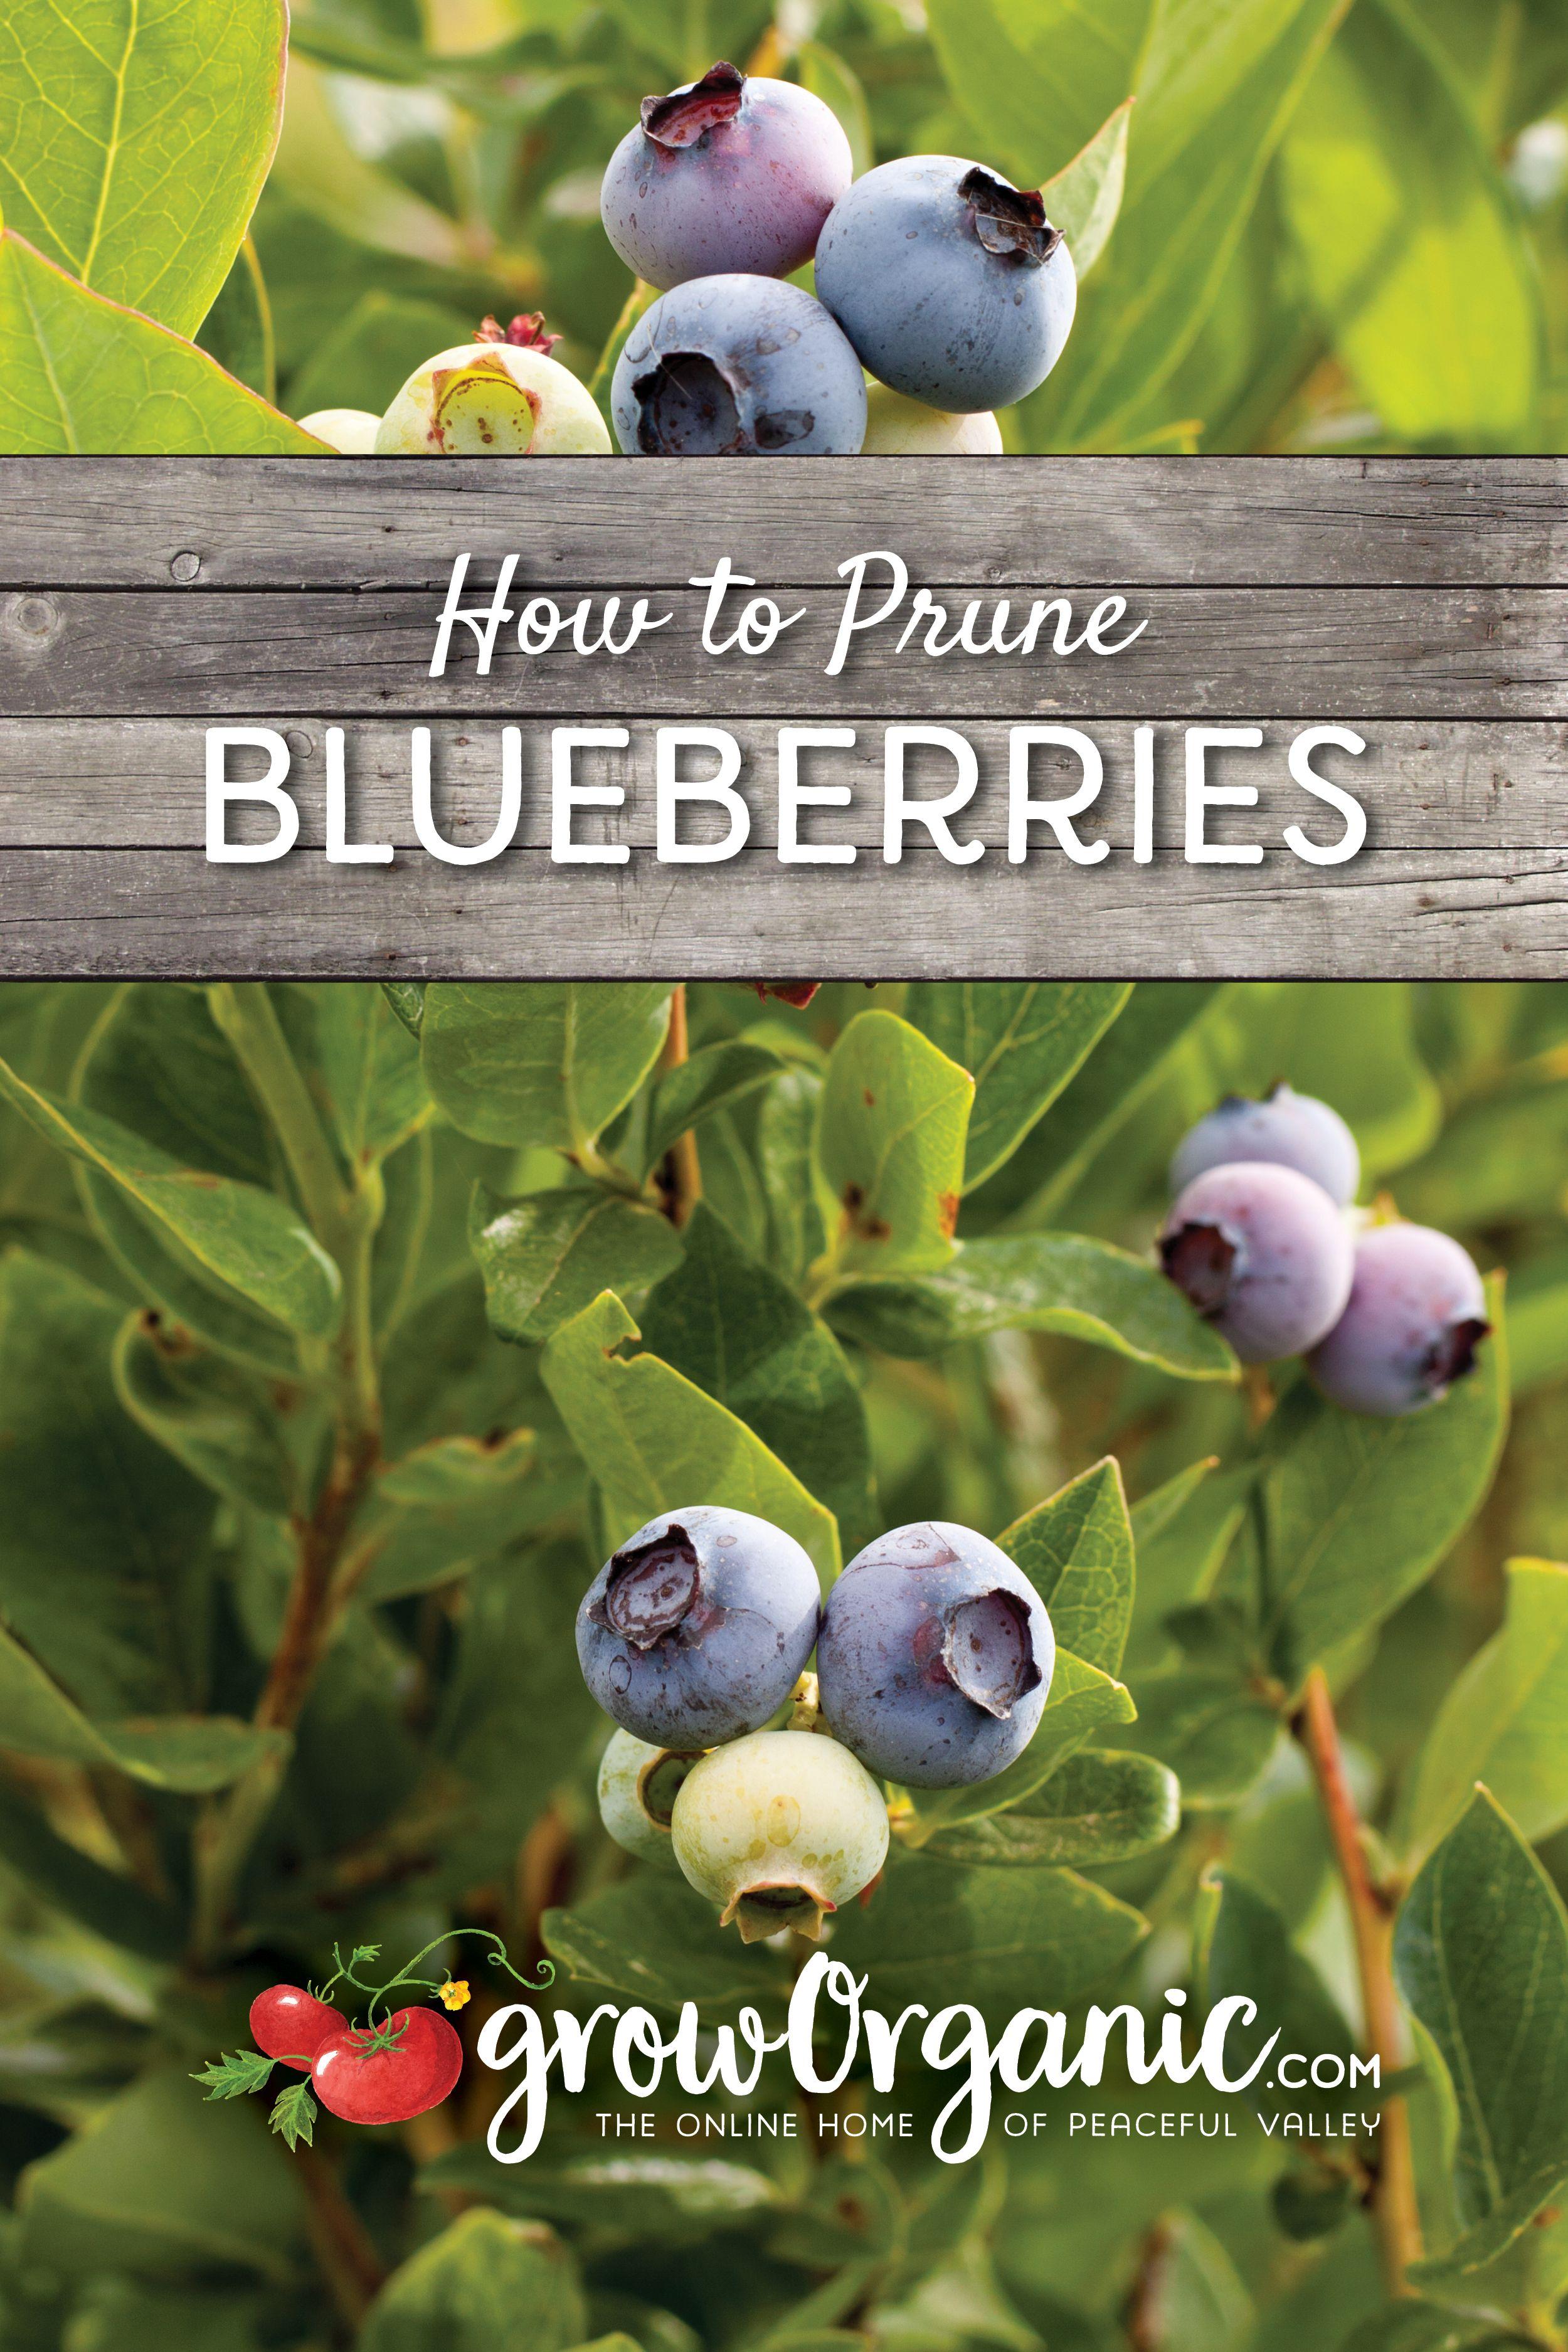 How To Prune Blueberries Growing Blueberries Bushes Growing Blueberries Blueberry Bushes